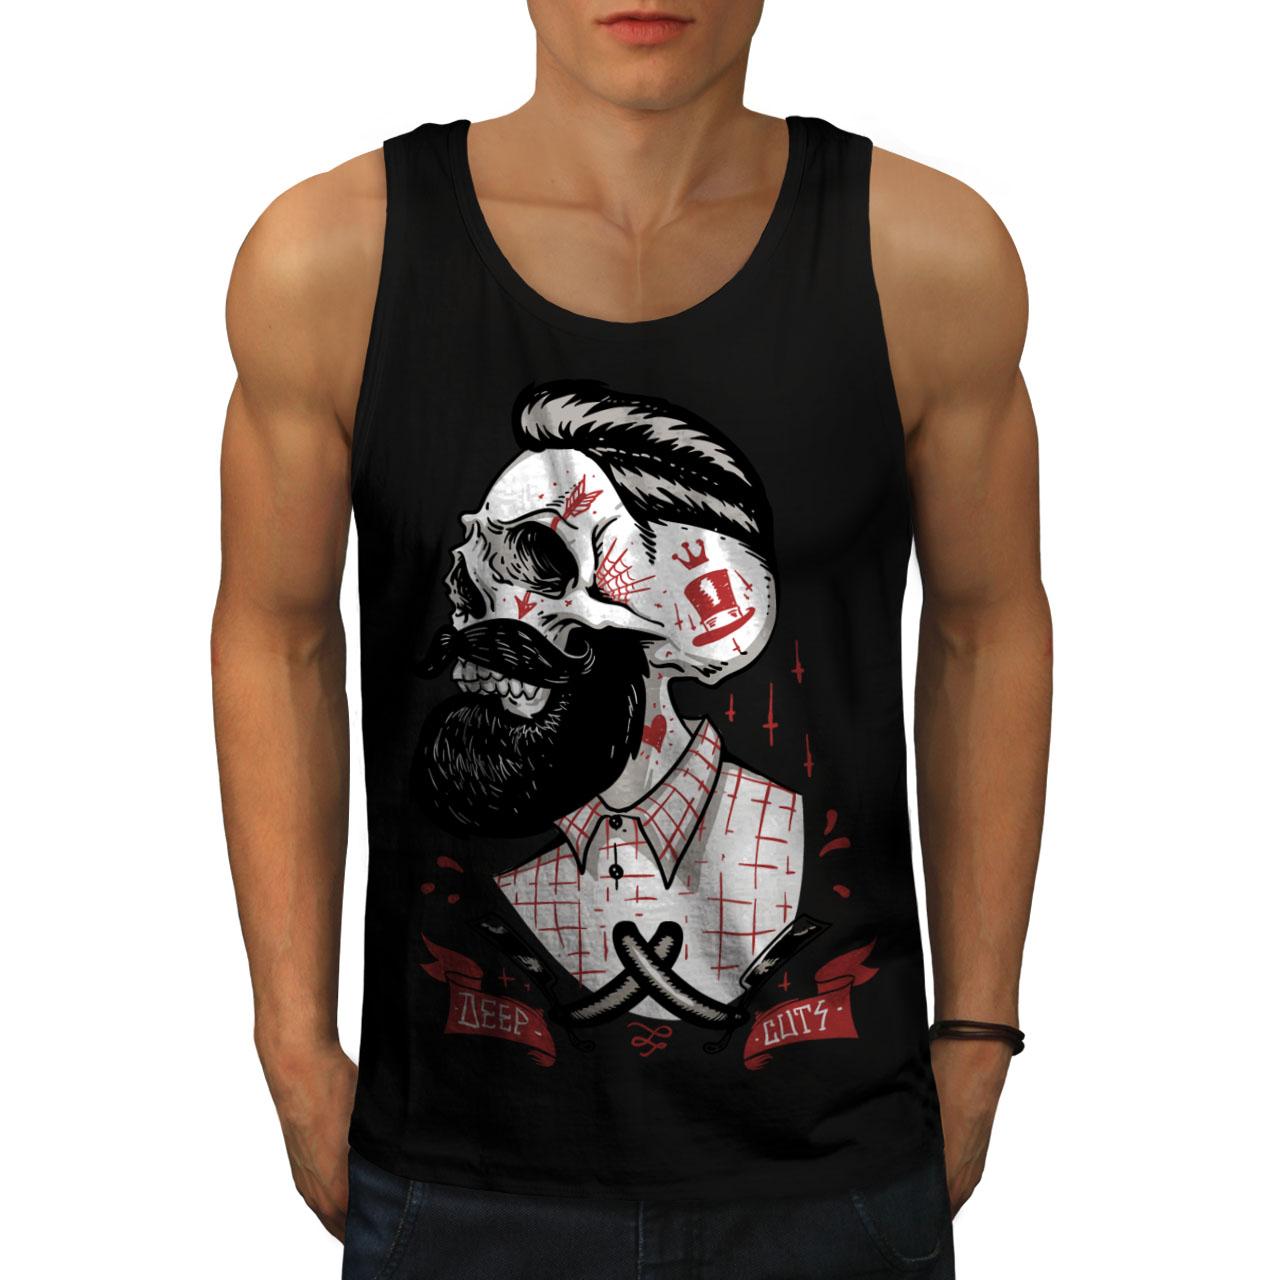 Wellcoda-Skull-Hippie-Beard-Mens-Tank-Top-Movement-Active-Sports-Shirt thumbnail 3